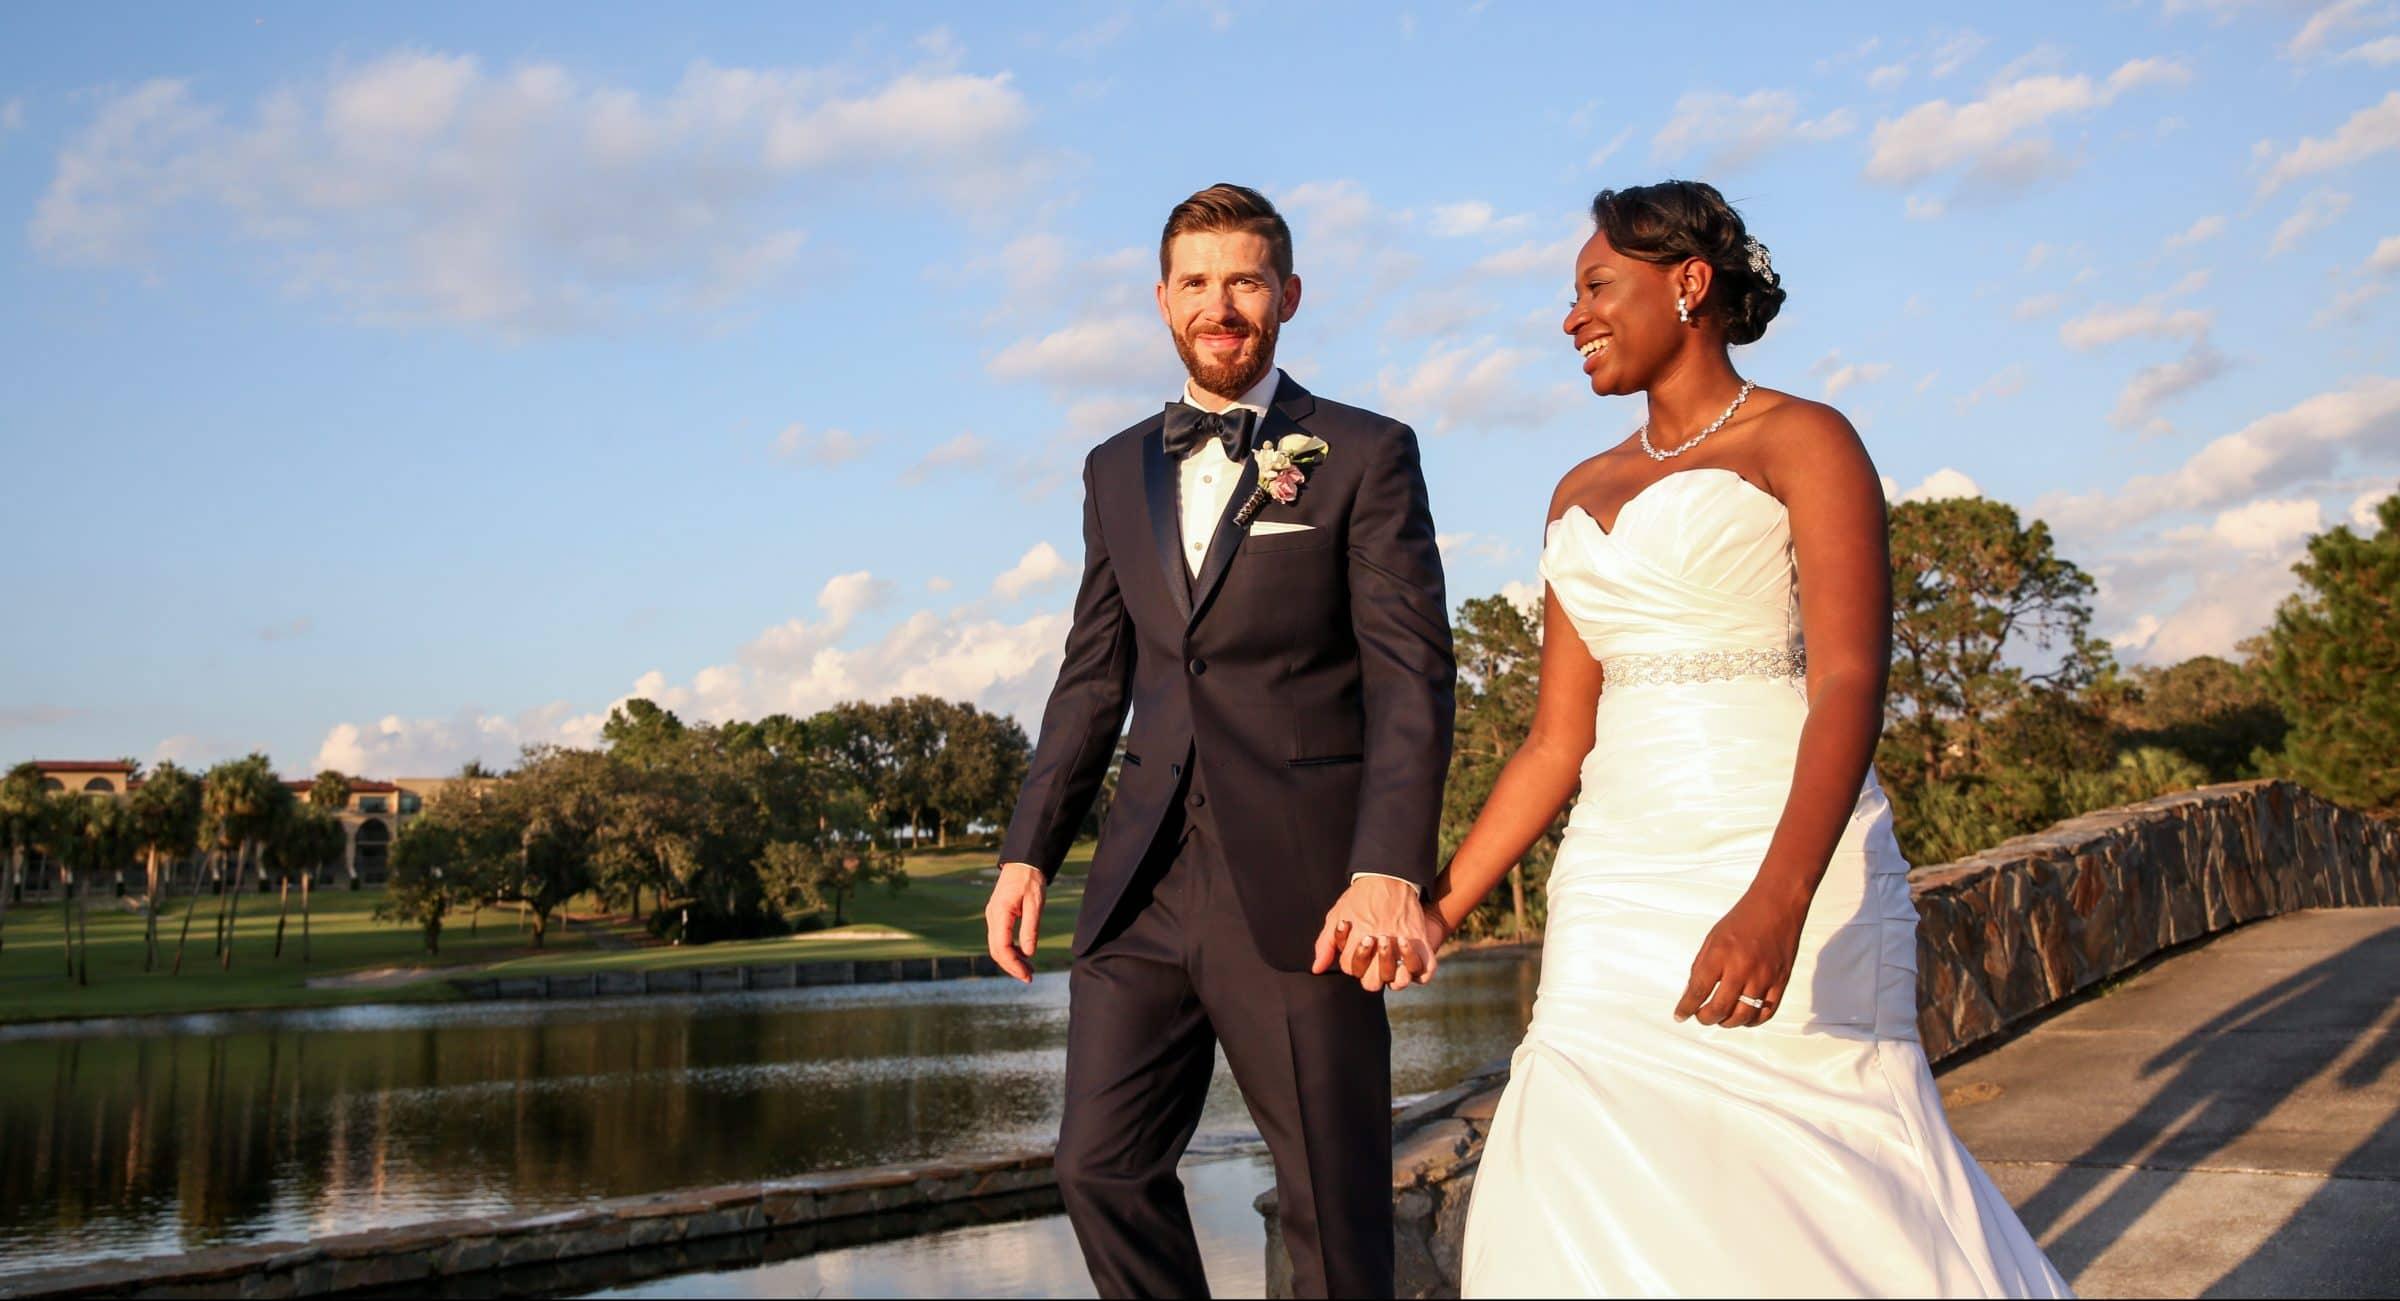 Bride and groom holding hands on stone bridge